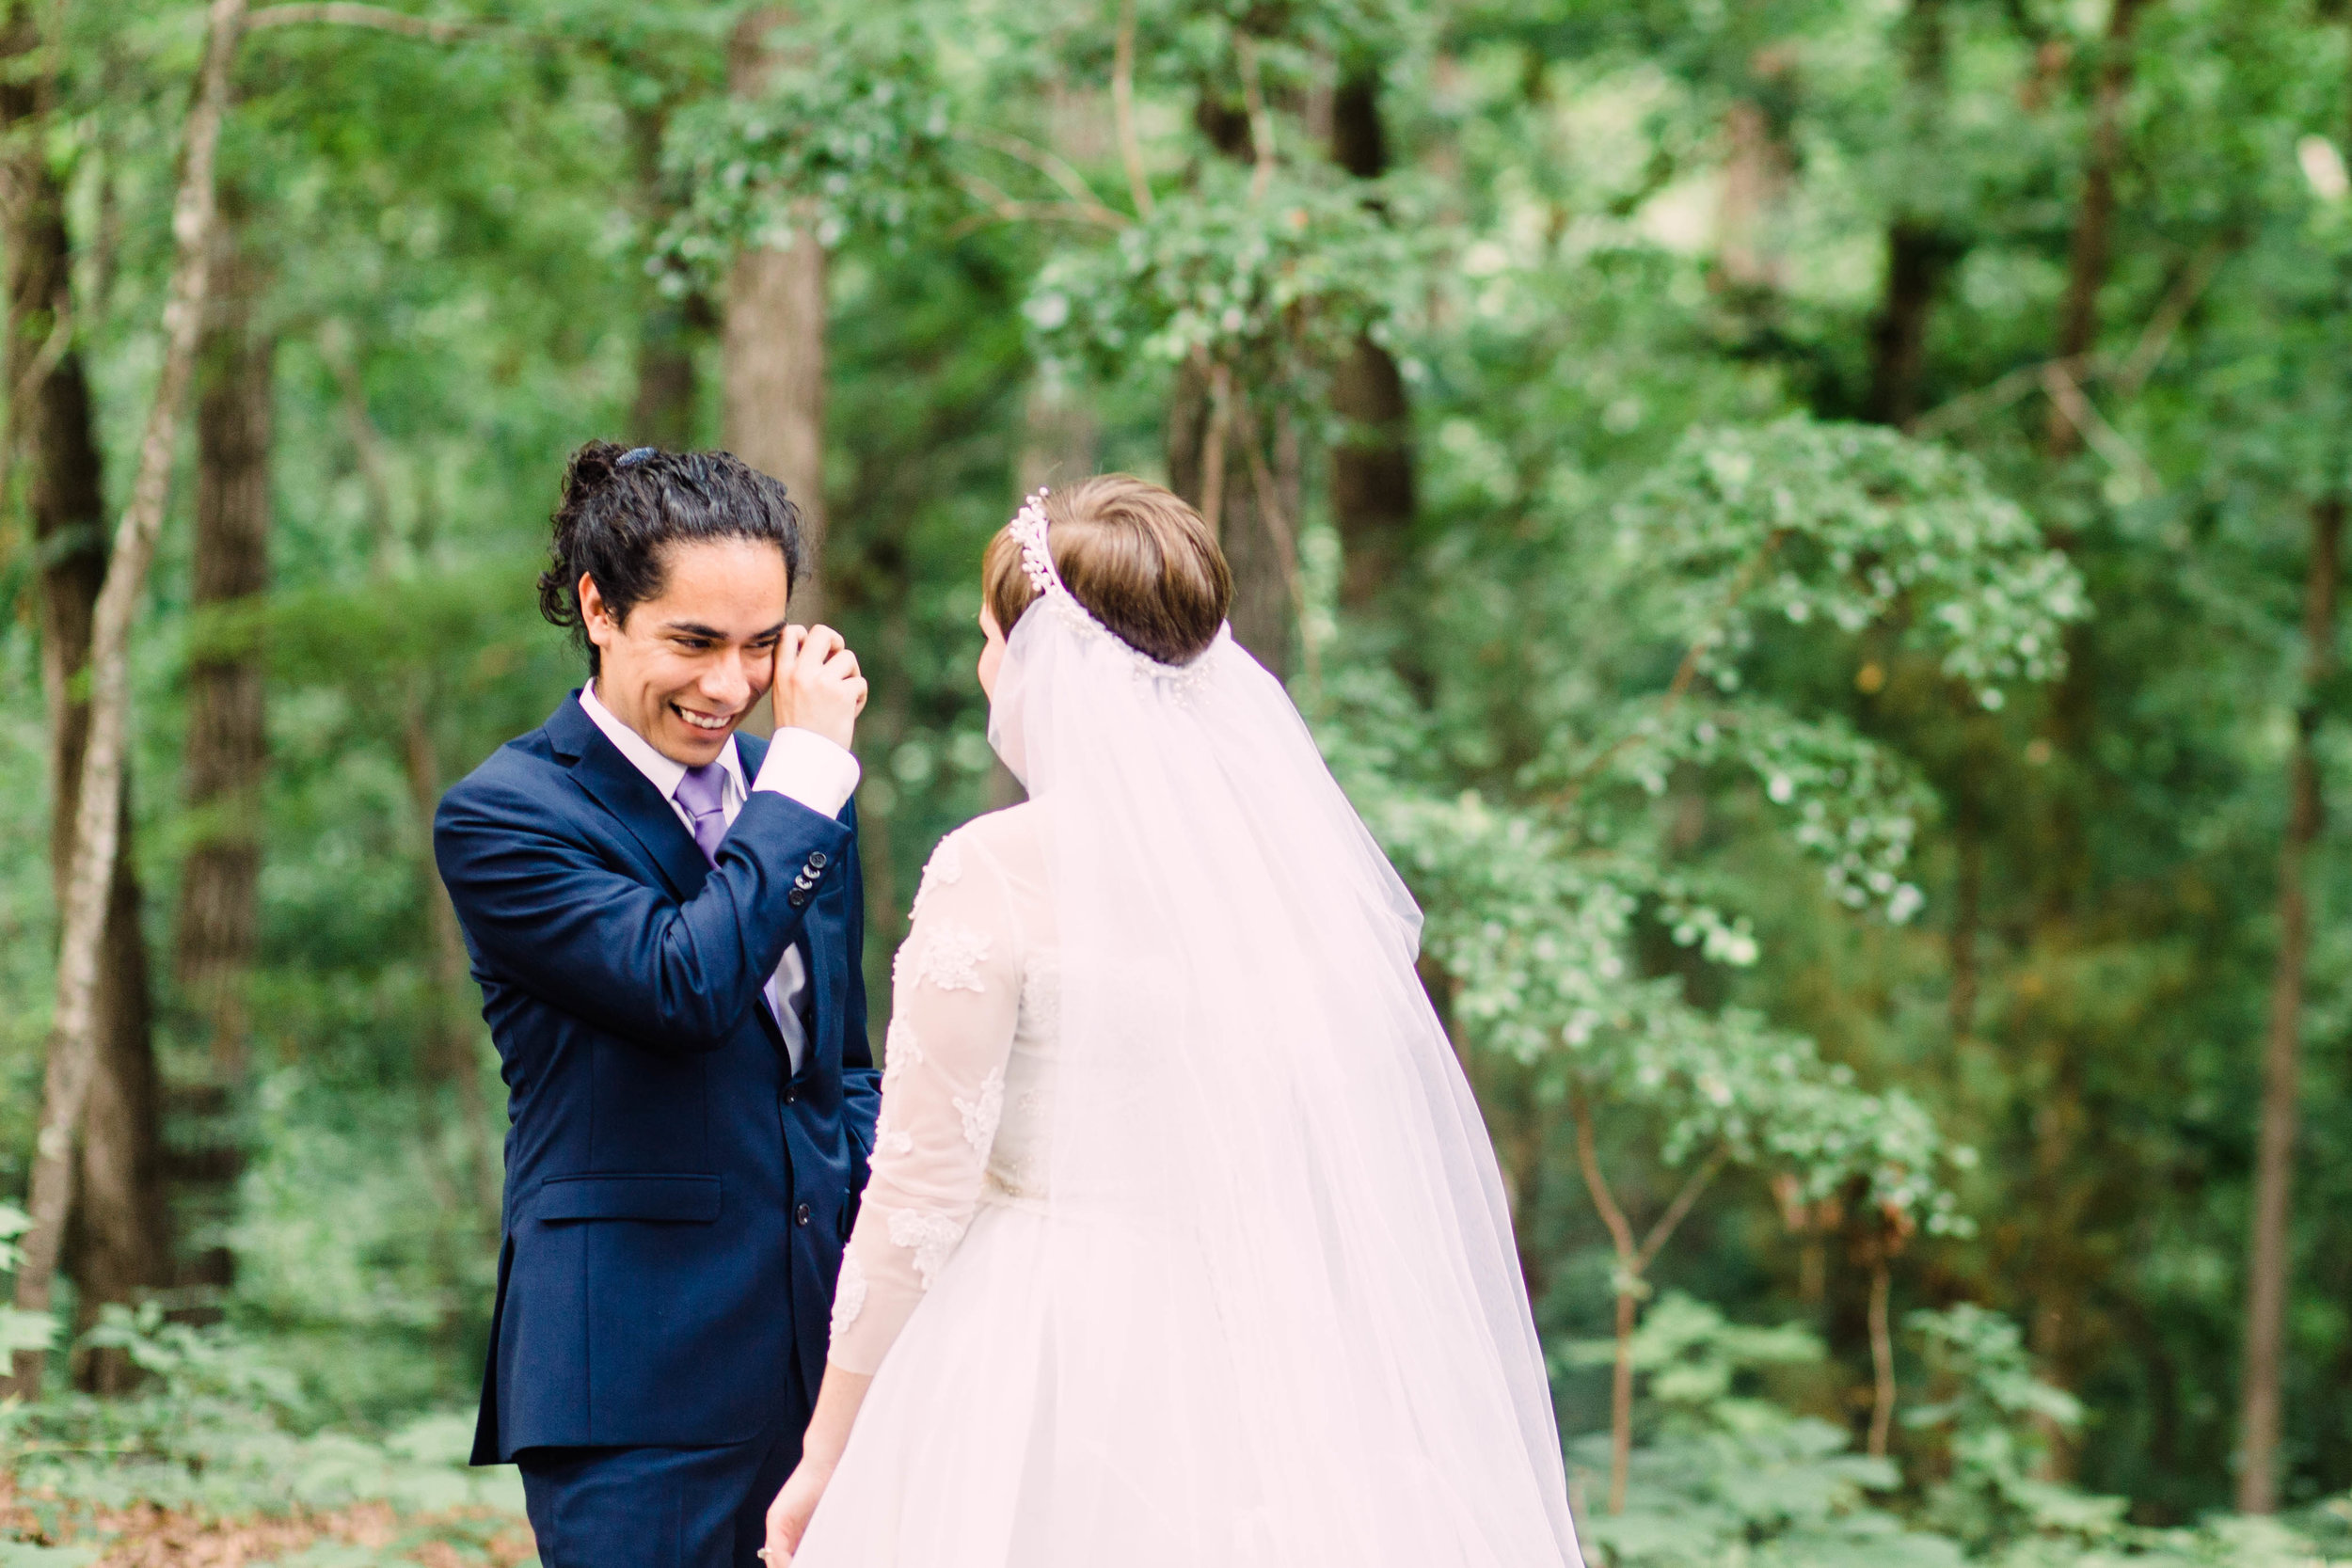 athen-botanical-garden-wedding-7.jpg